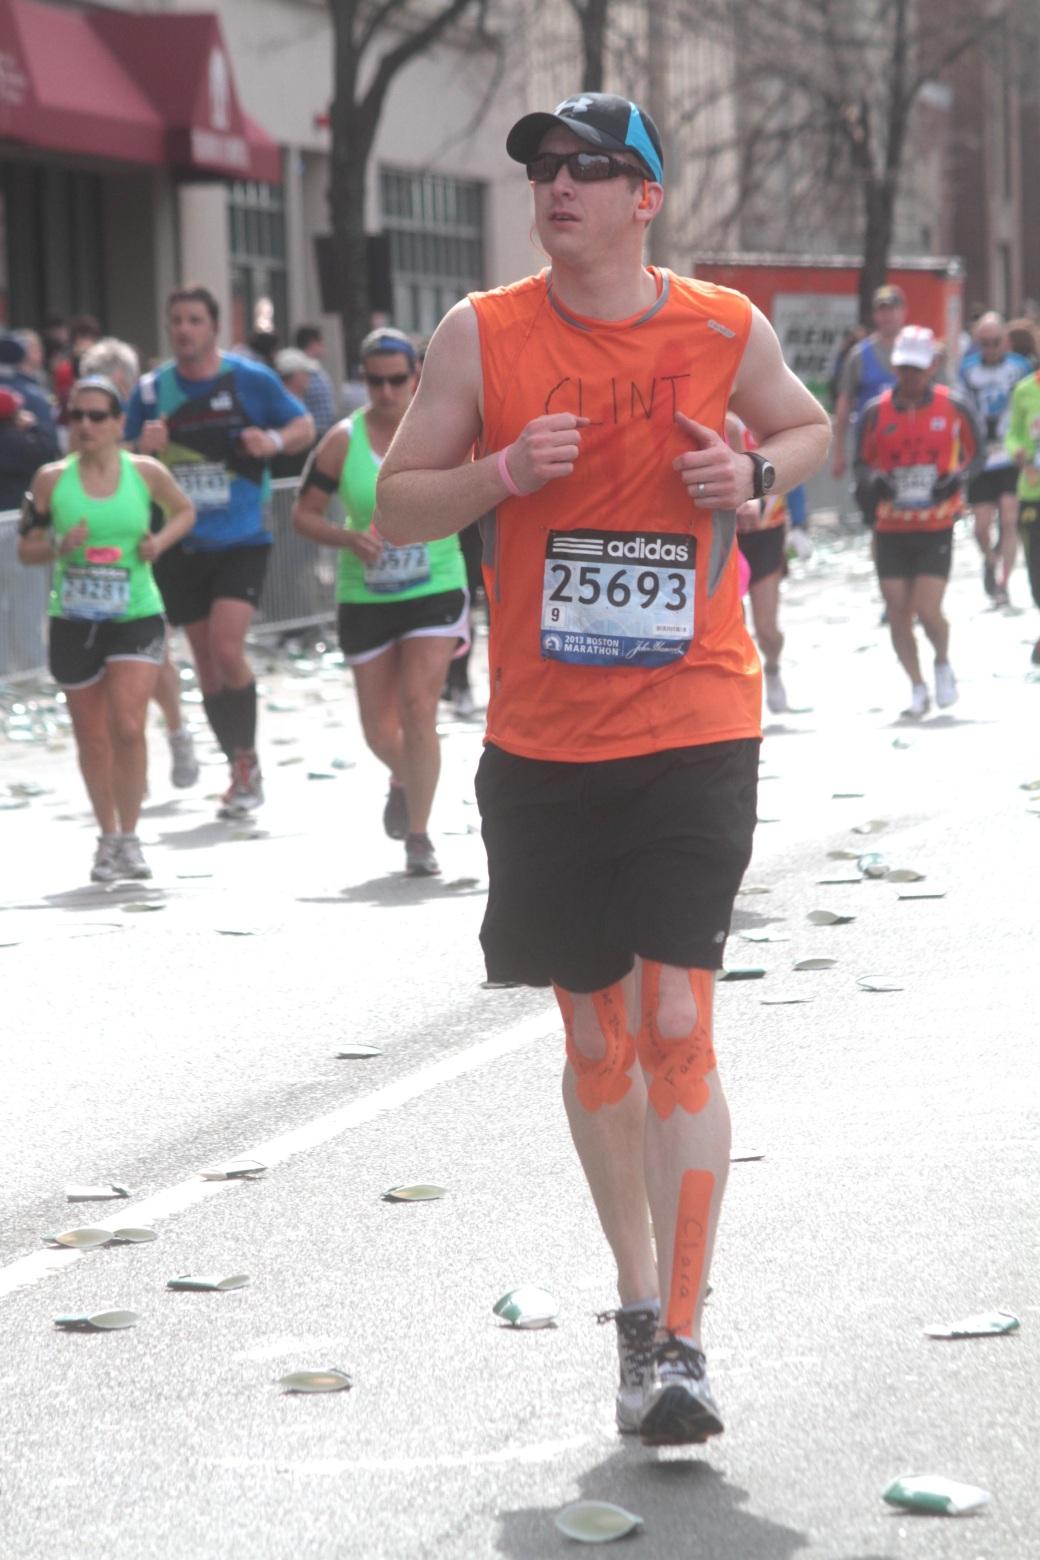 boston marathon 2013 number 25693